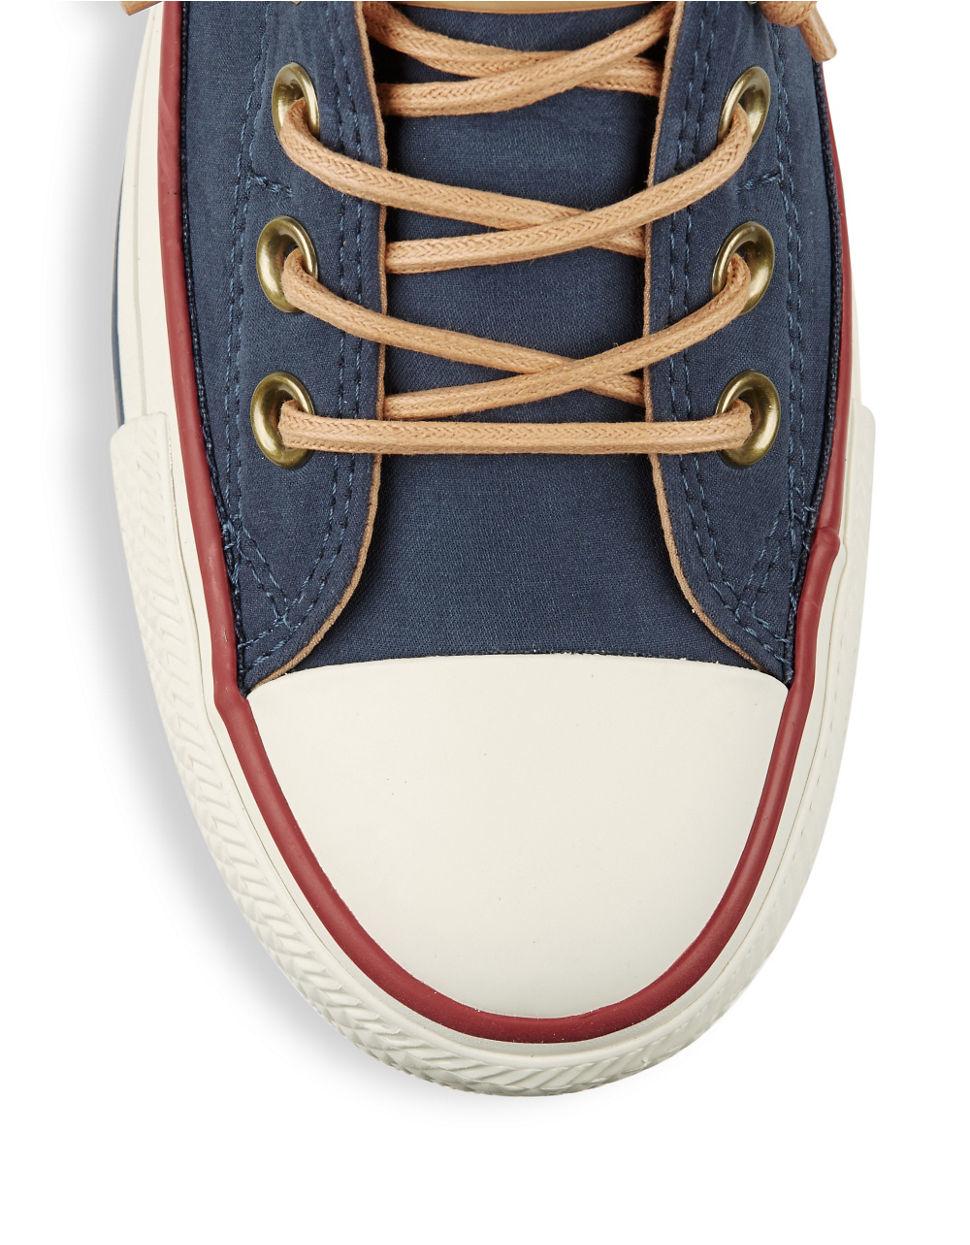 9799d4b5babd57 Sneakers Blue Lyst Lace Converse Up In qXqt8rzw